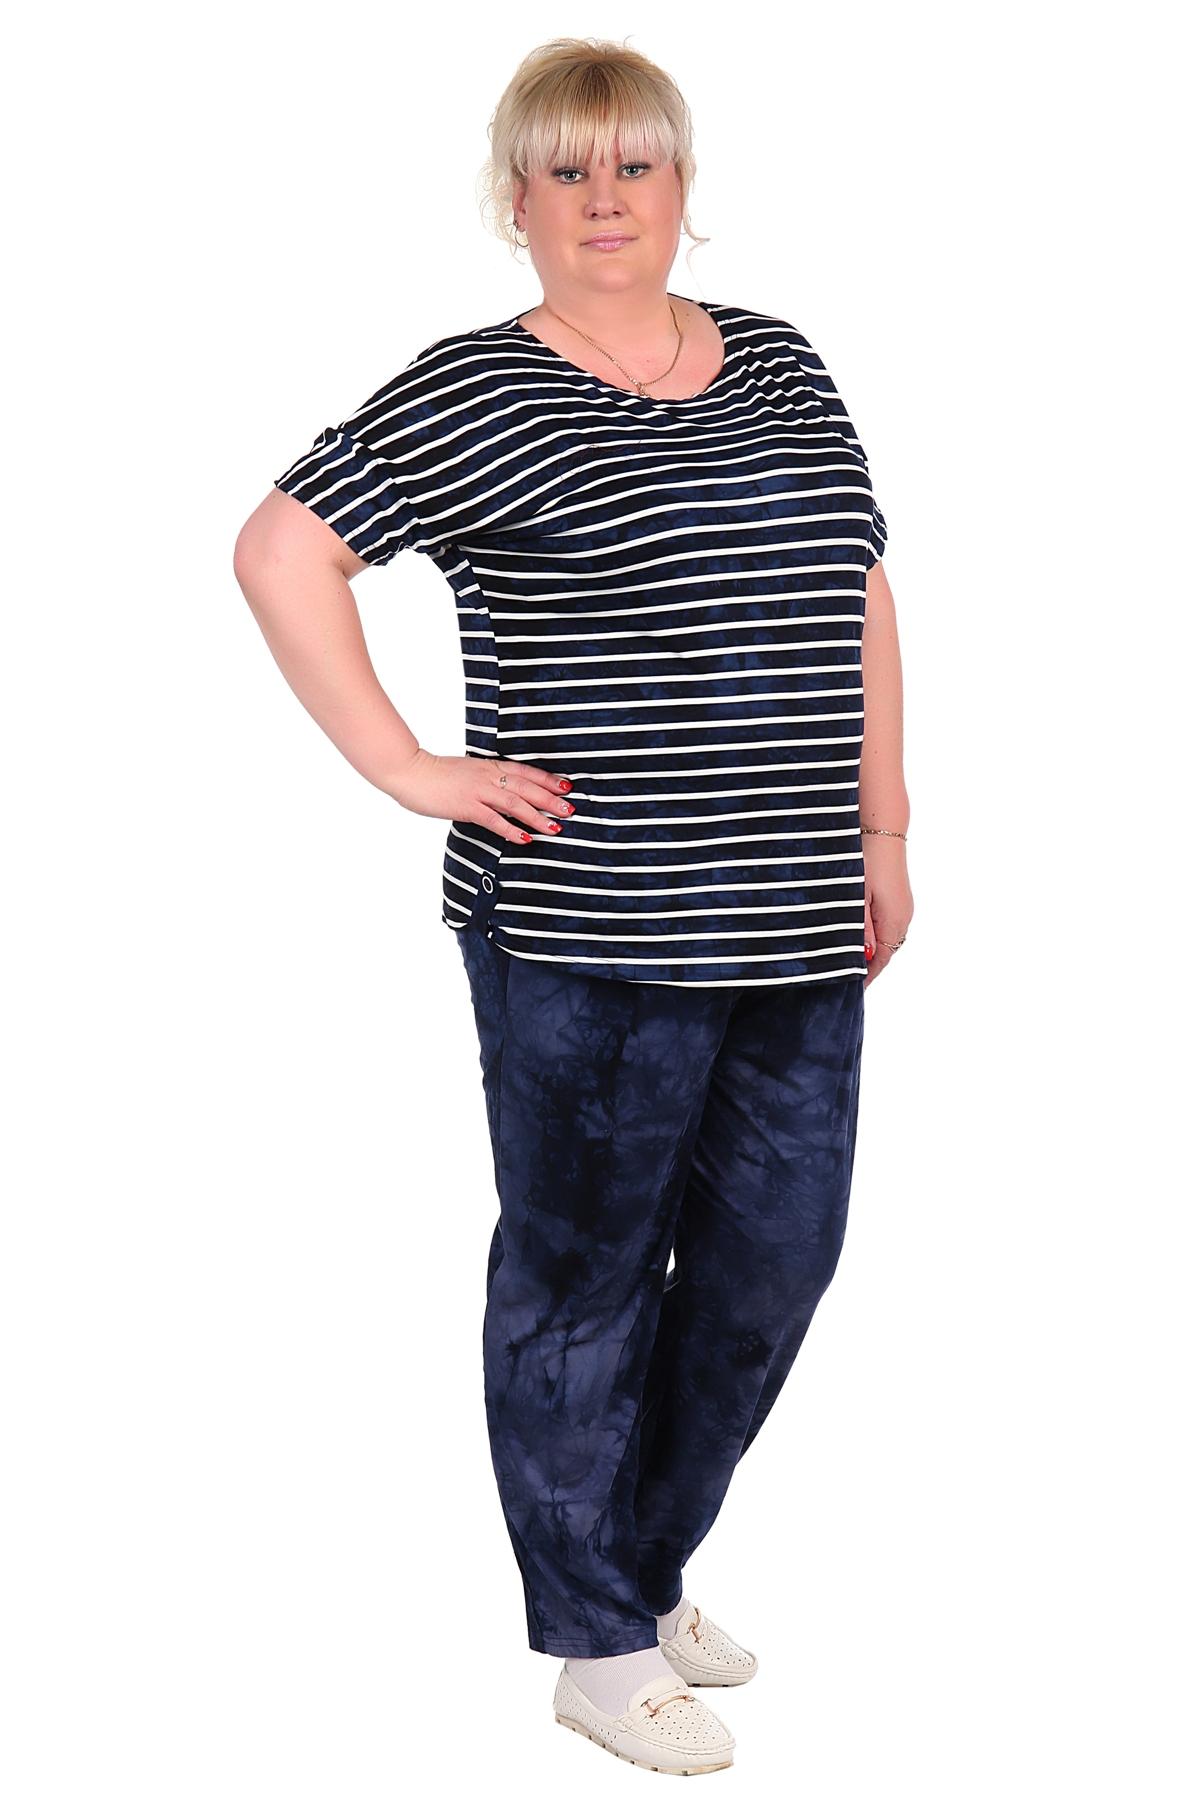 Жен. костюм арт. 16-0018 Темно-синий р. 60 блузы